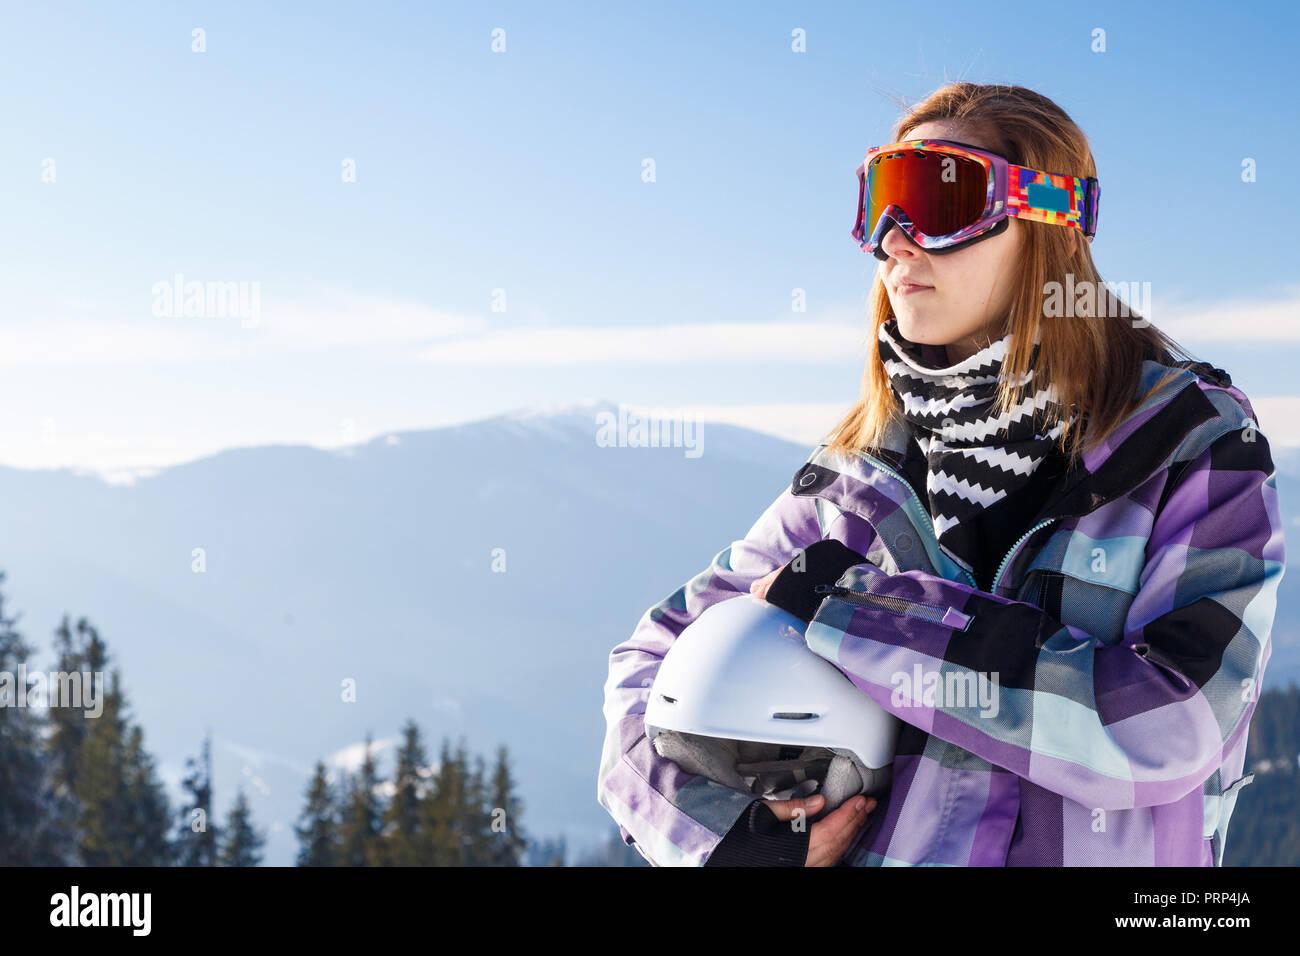 Skier girl on the background of high mountain Carpathians in Ukraine. Winter sport. - Stock Image